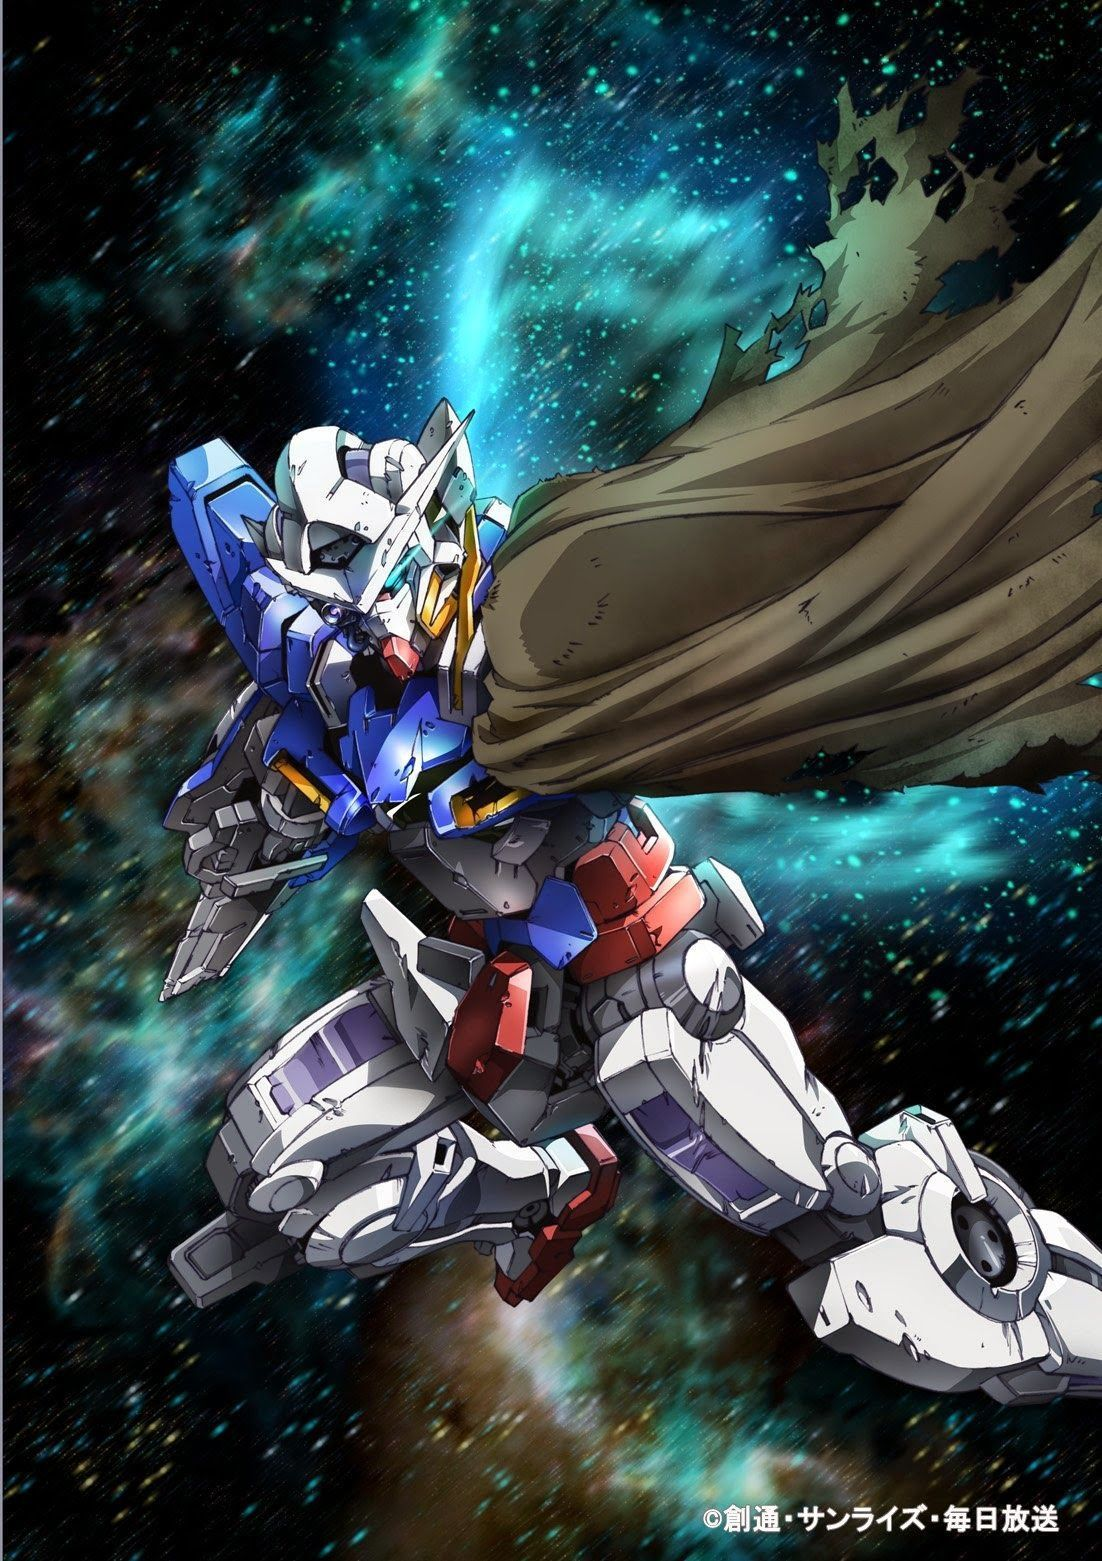 Gundam Exia Wallpapers Wallpaper Cave Gundam Exia Gundam Exia Wallpapers Gundam Wallpapers Gundam exia wallpaper 4k